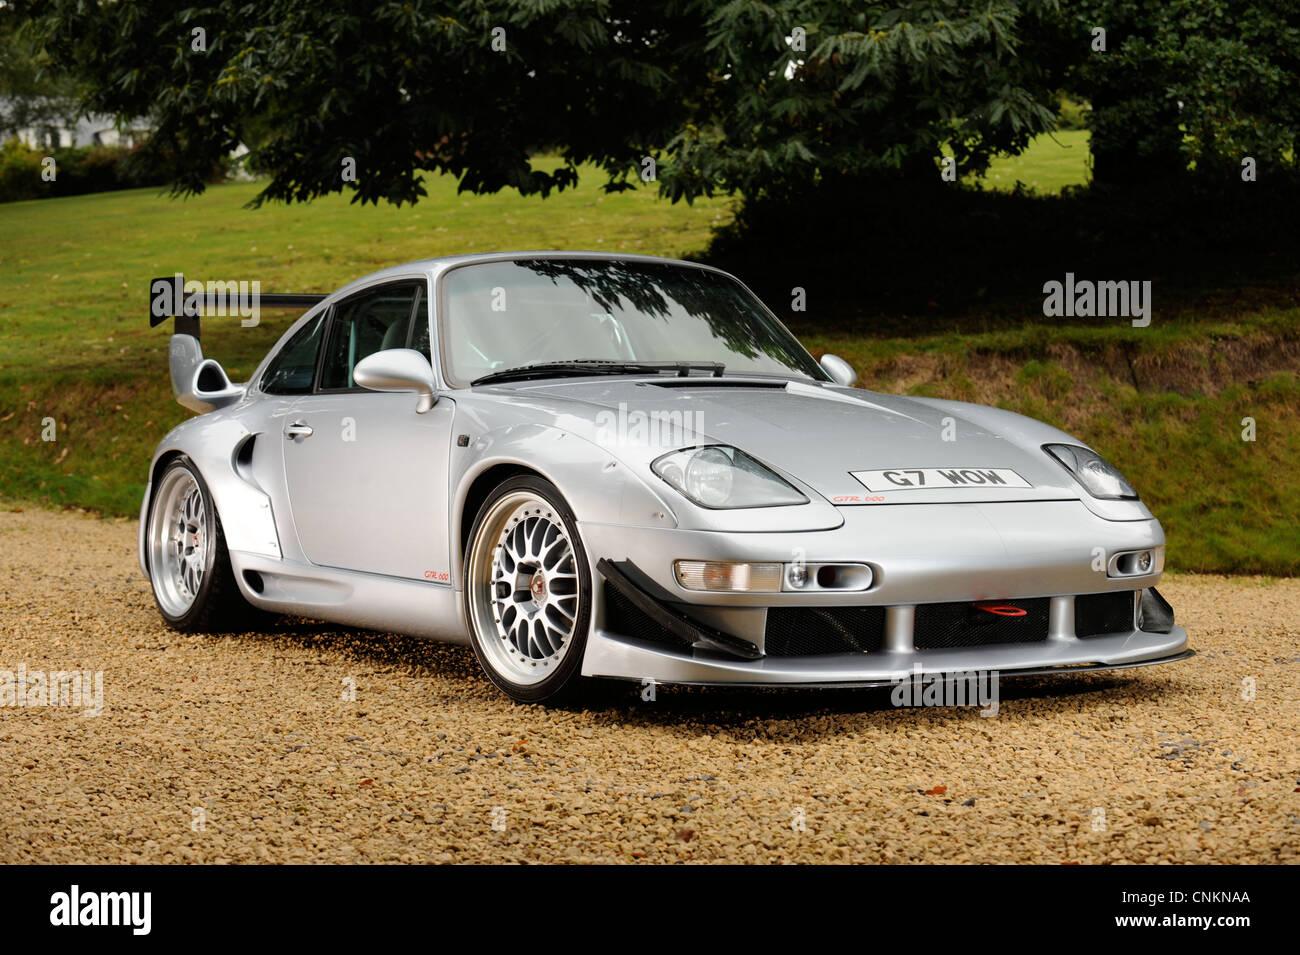 1996 Porsche Gemballa 600 GTR - Stock Image